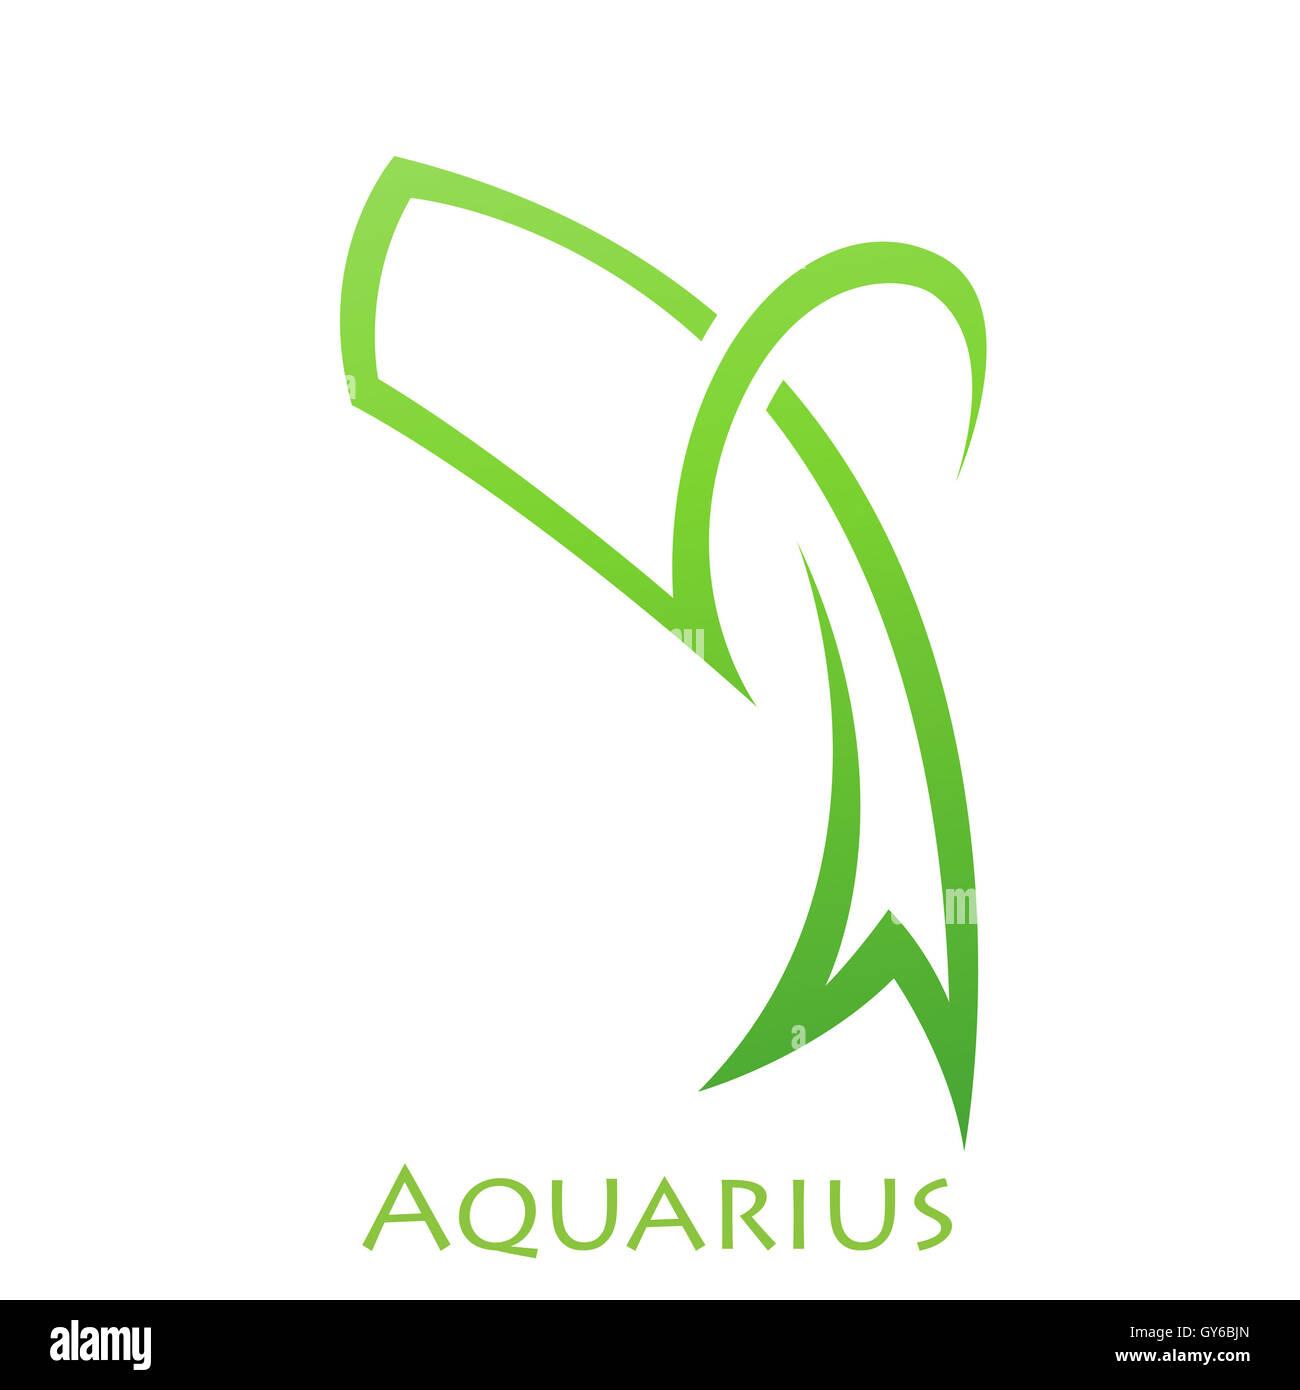 Illustration of simplistic lines aquarius zodiac star sign illustration of simplistic lines aquarius zodiac star sign isolated on a white background buycottarizona